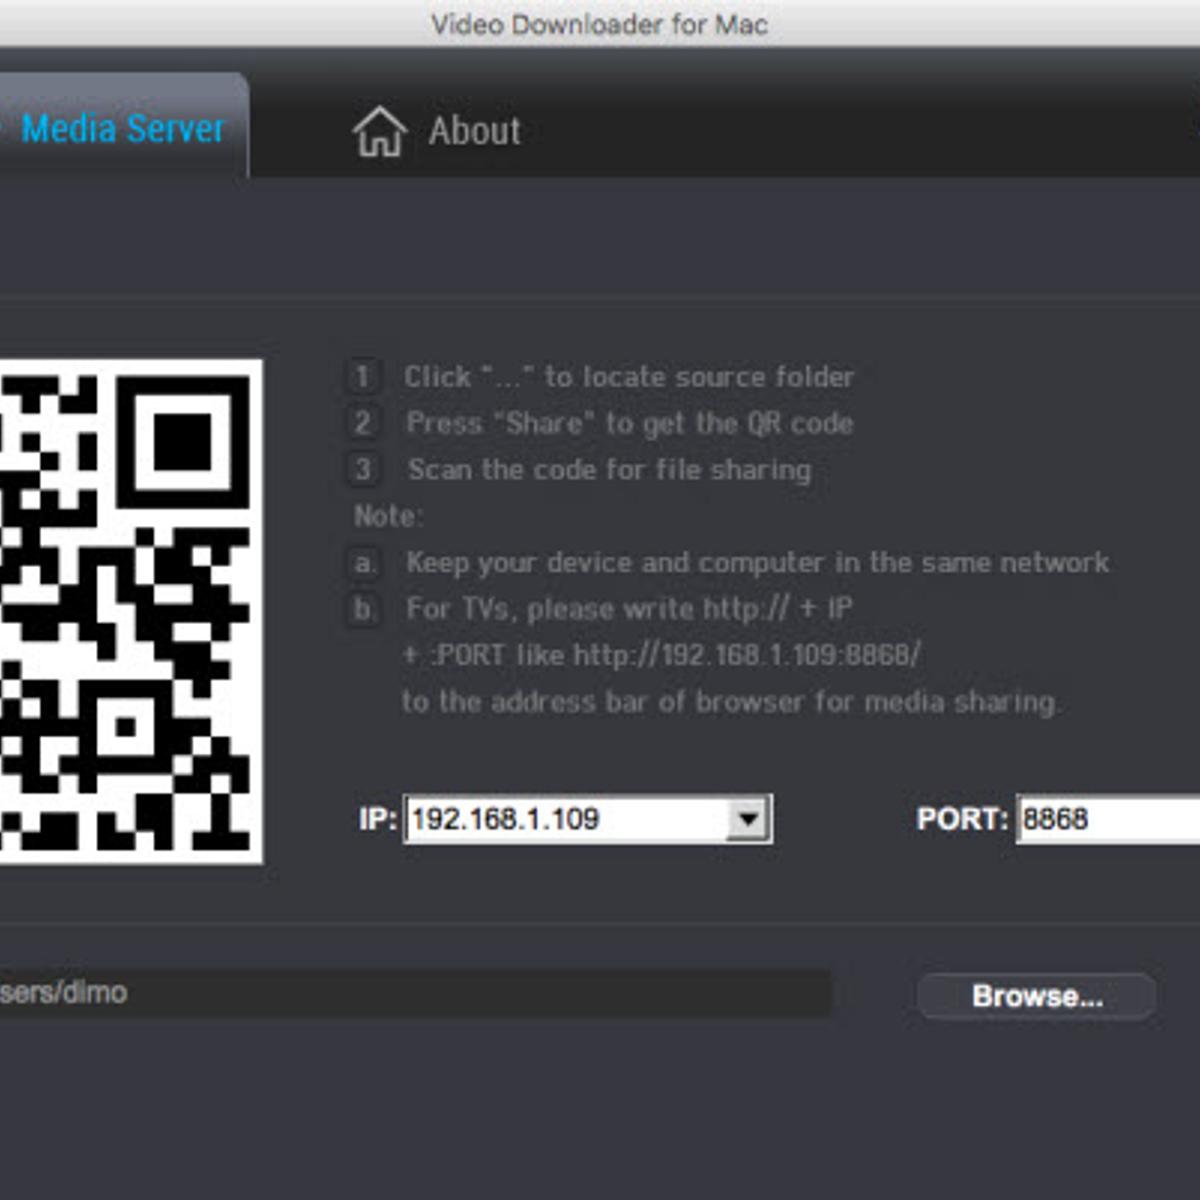 Dimo Video Downloader Alternatives and Similar Software